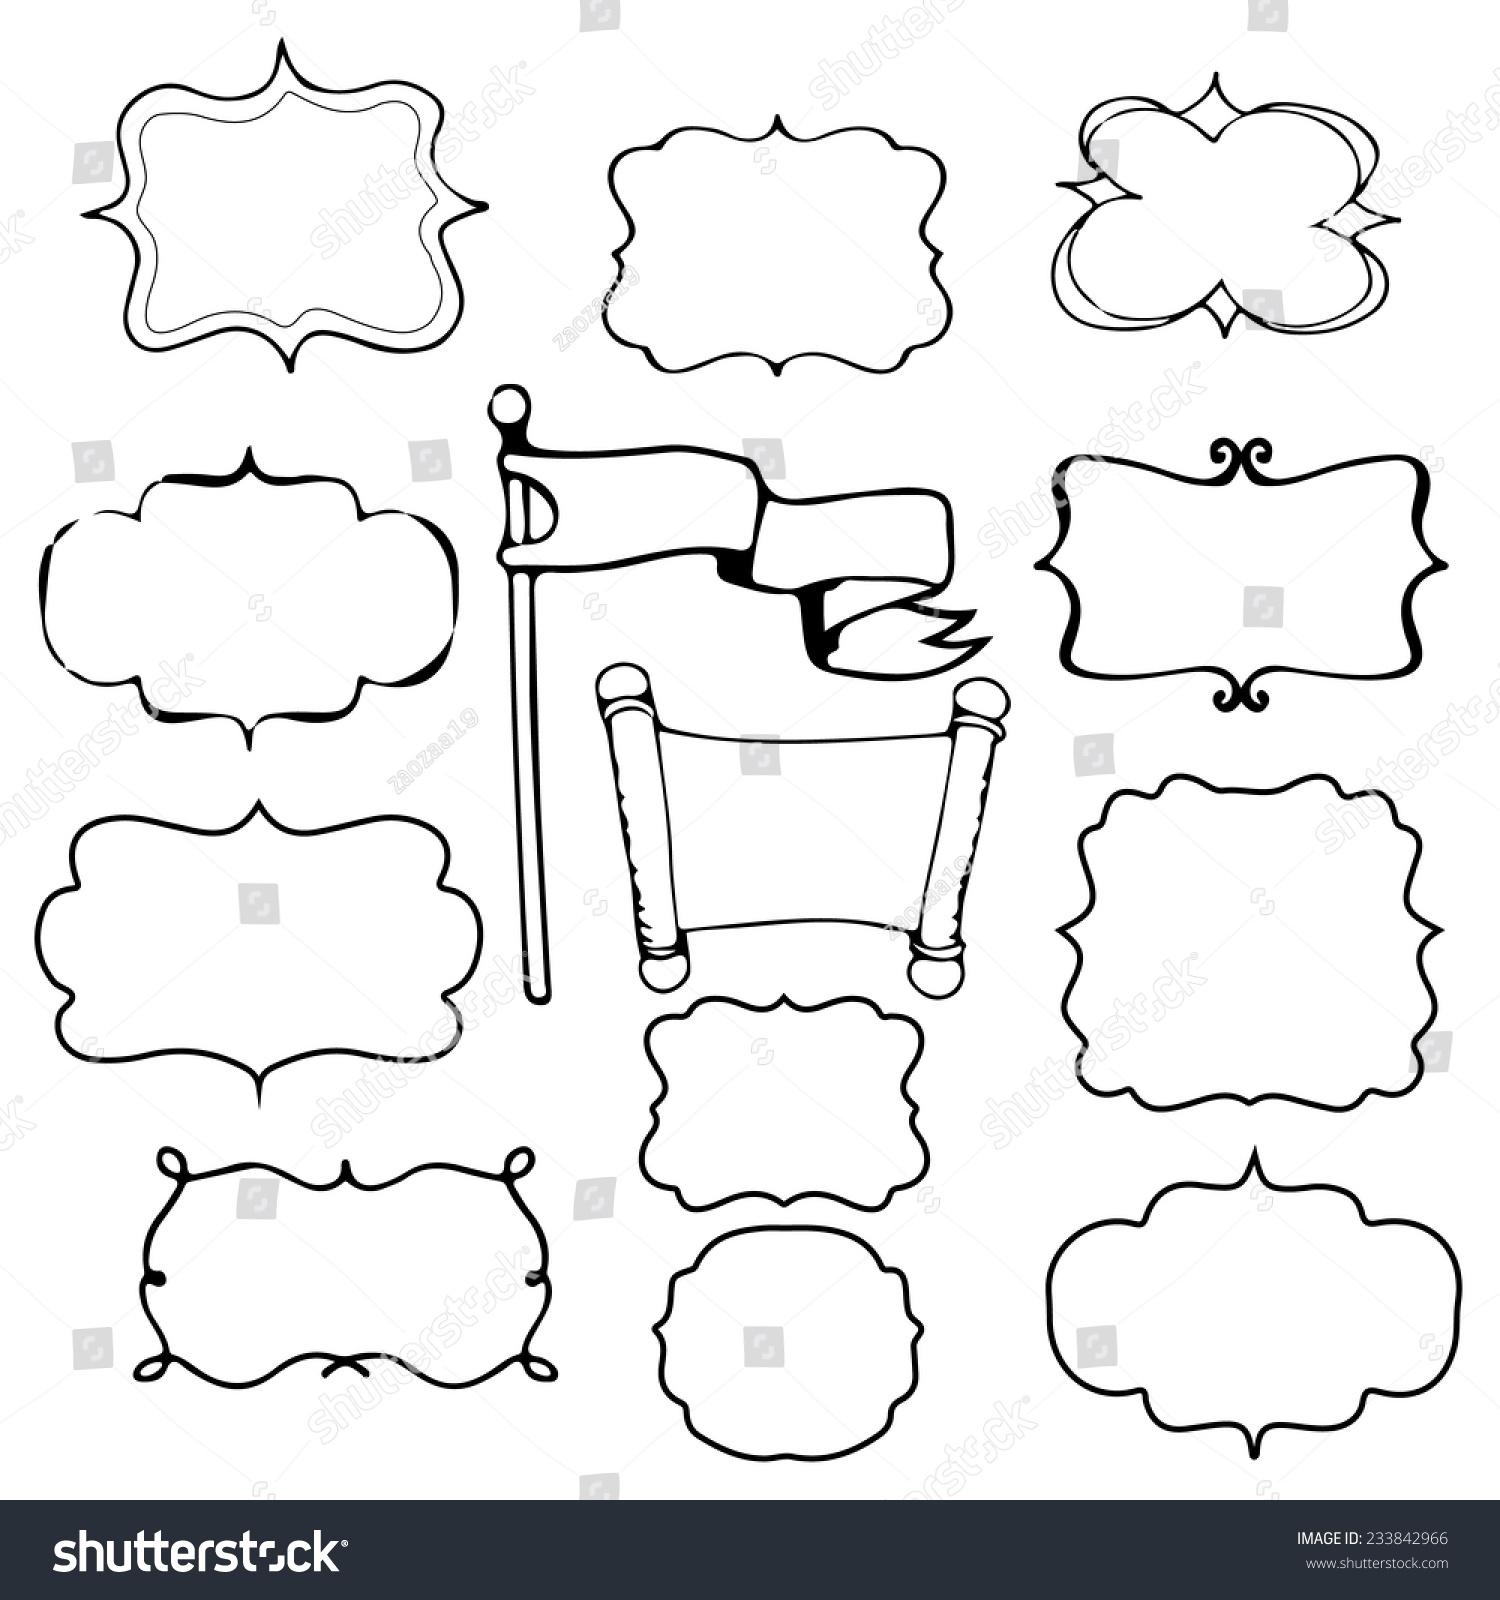 Hand Draw Frame Stock Vector 233842966 - Shutterstock